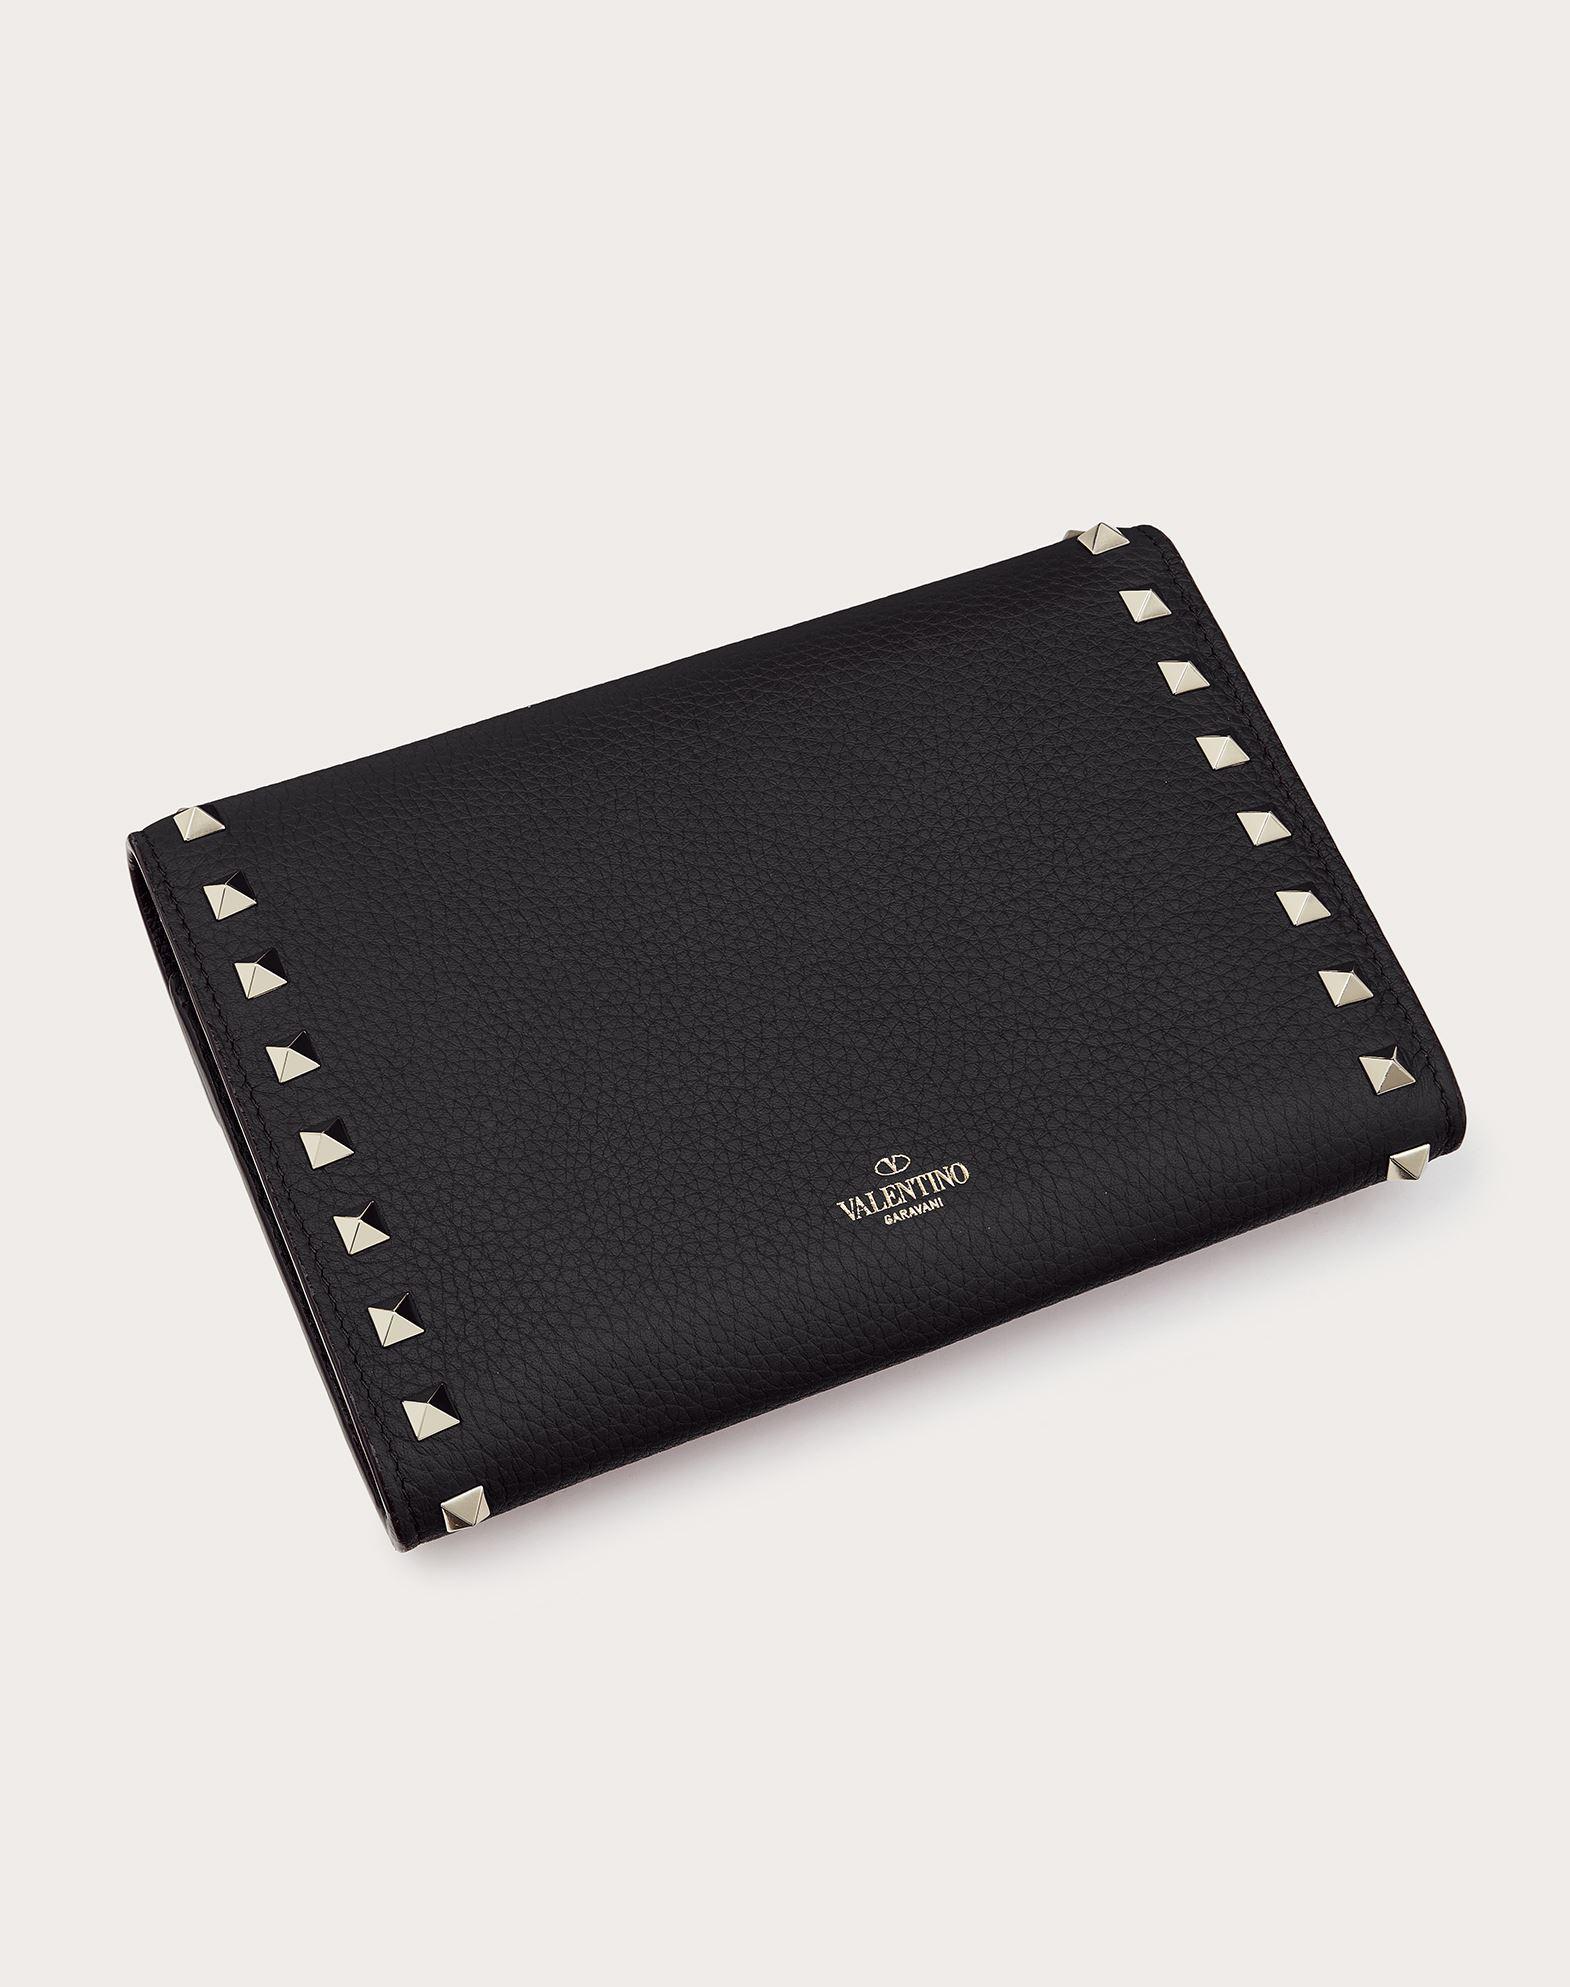 VALENTINO GARAVANI Rockstud Wallet with chain CHAIN WALLETS D d